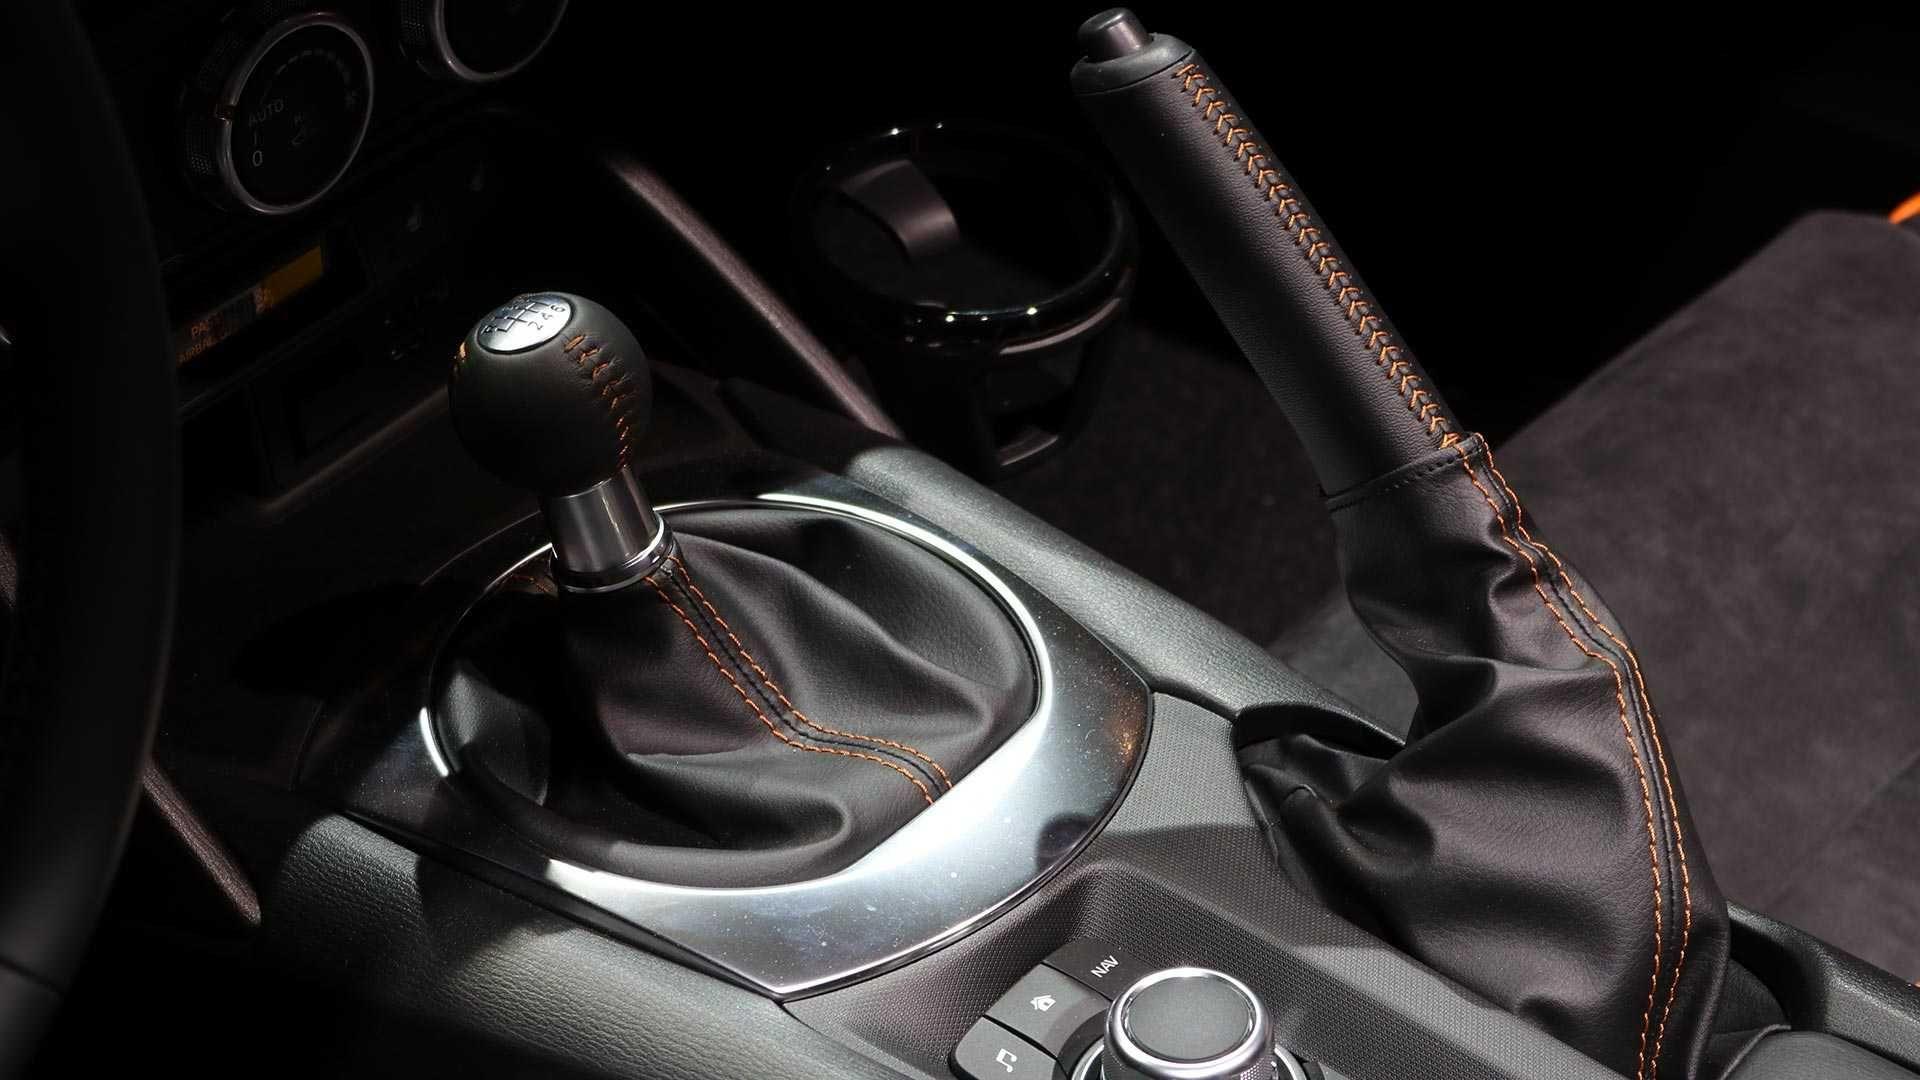 Вогняно-руда Mazda MX-5 Miata 30th Anniversary Edition осяяла стенд у Чікаго